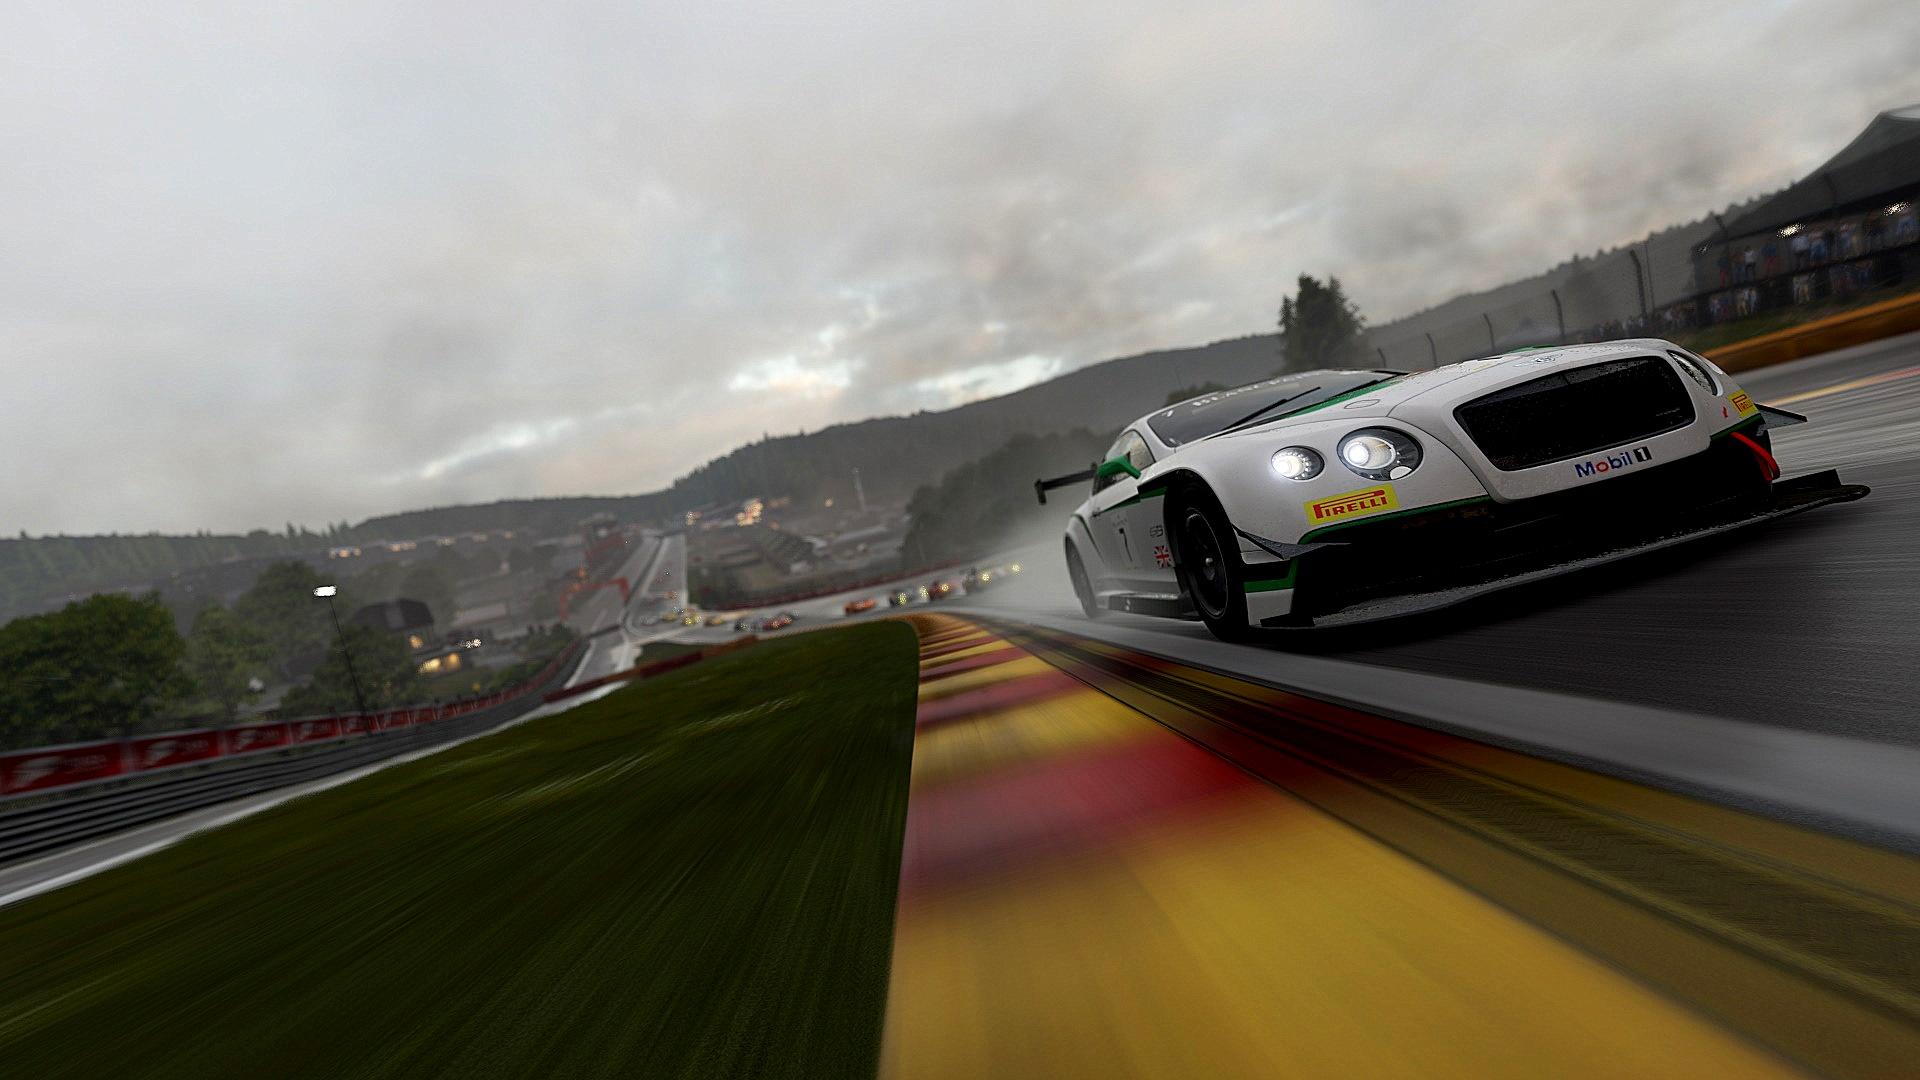 Free Images Driving Sports Car Supercar Race Track Screenshot